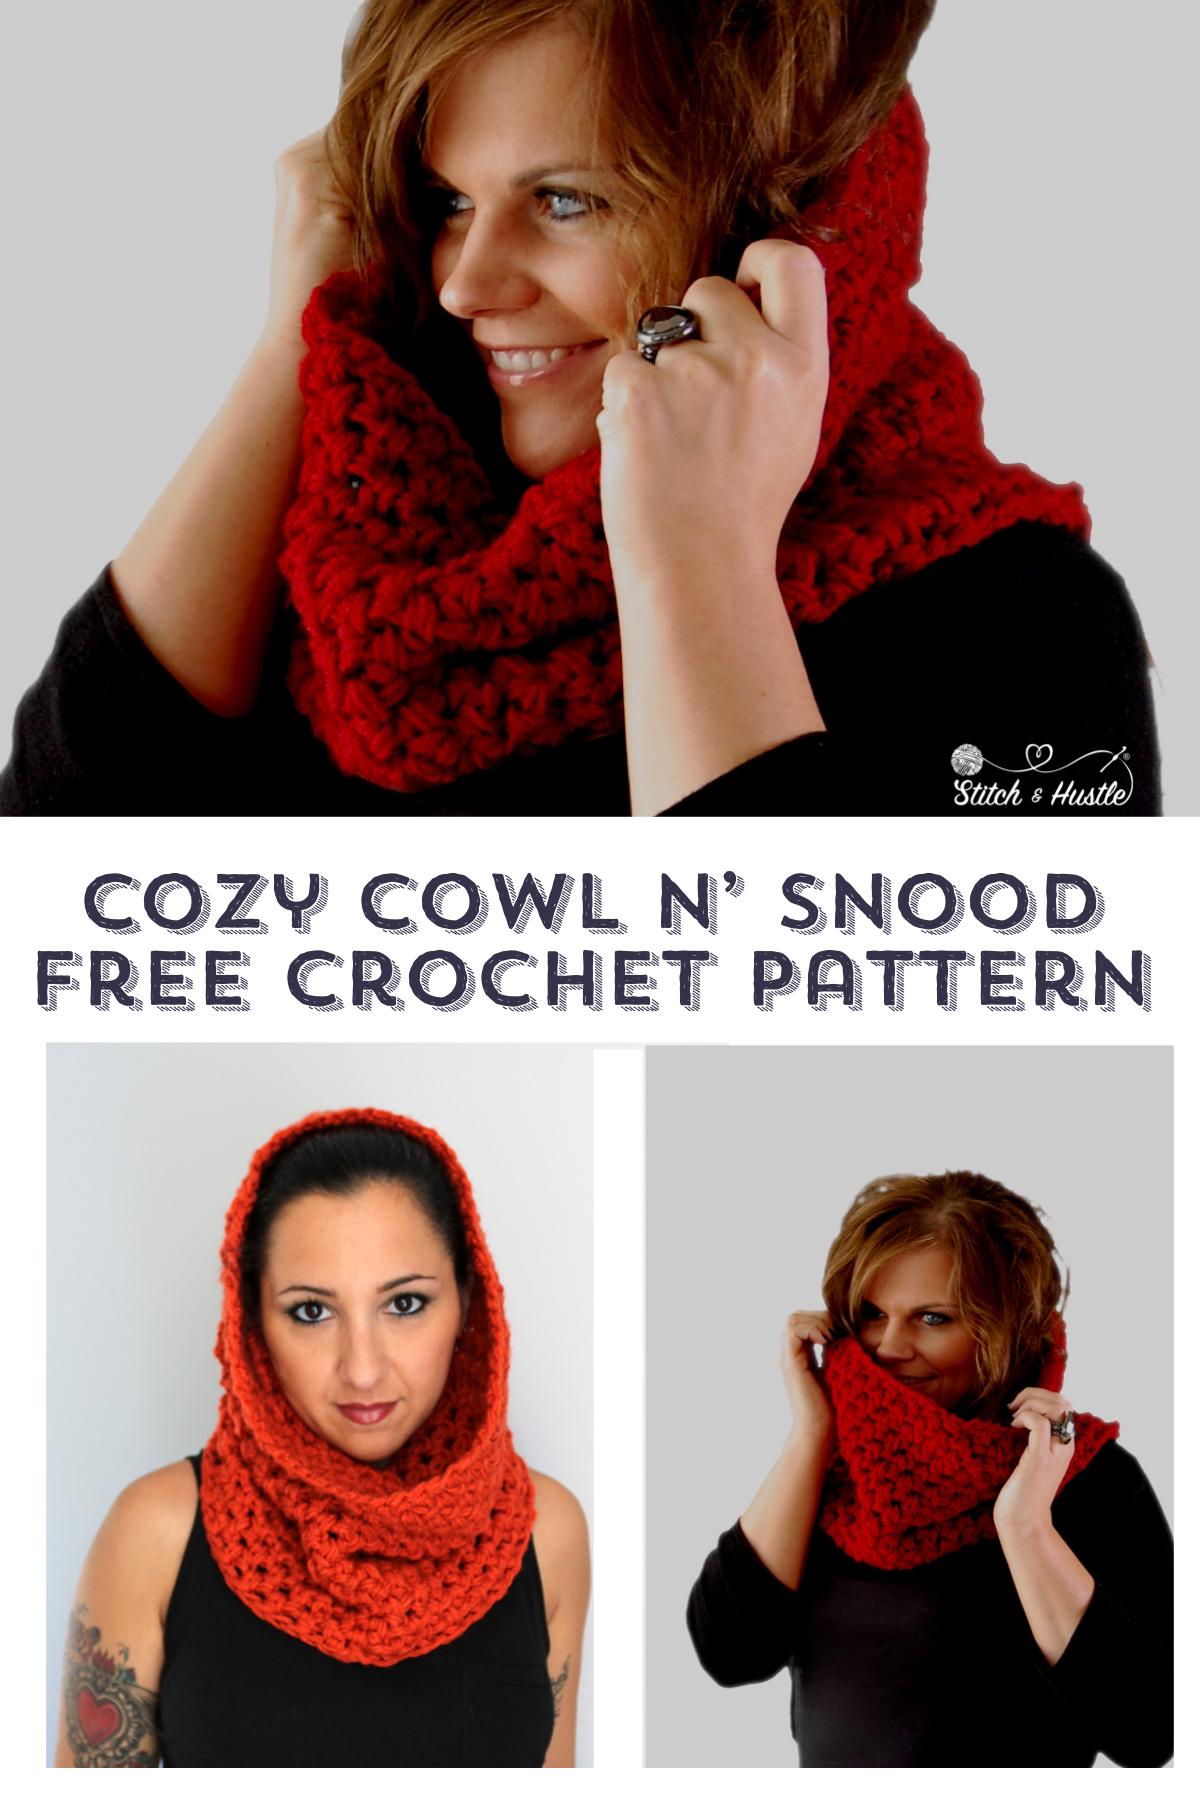 Cozy-cowl-snood-free-crochet-pattern.png